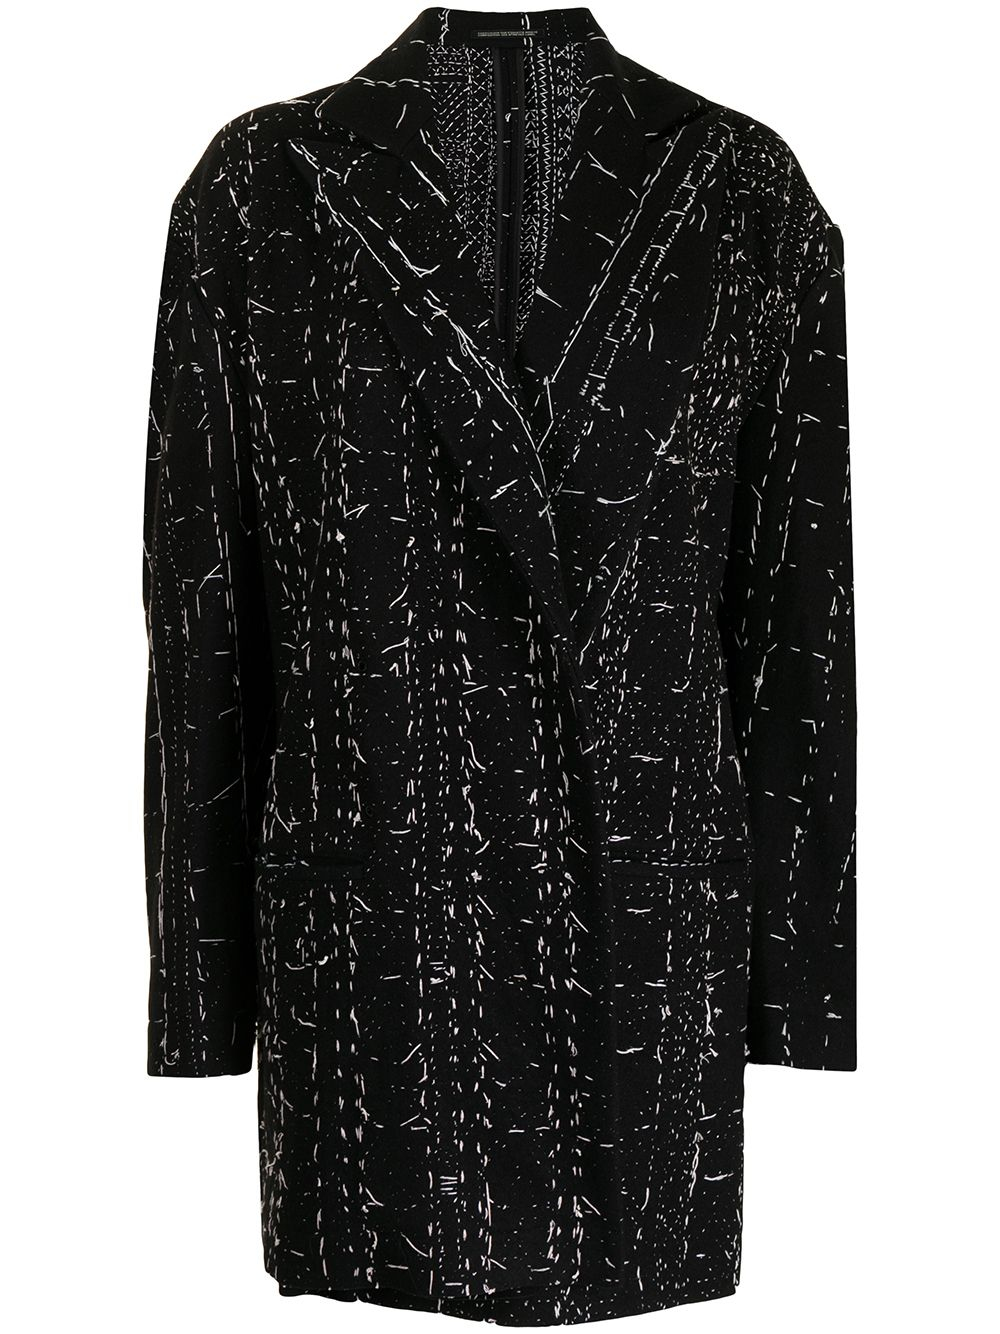 giacca oversize con impunture cucite a mano YOHJI YAMAMOTO   Giacca   FX-J03-1121